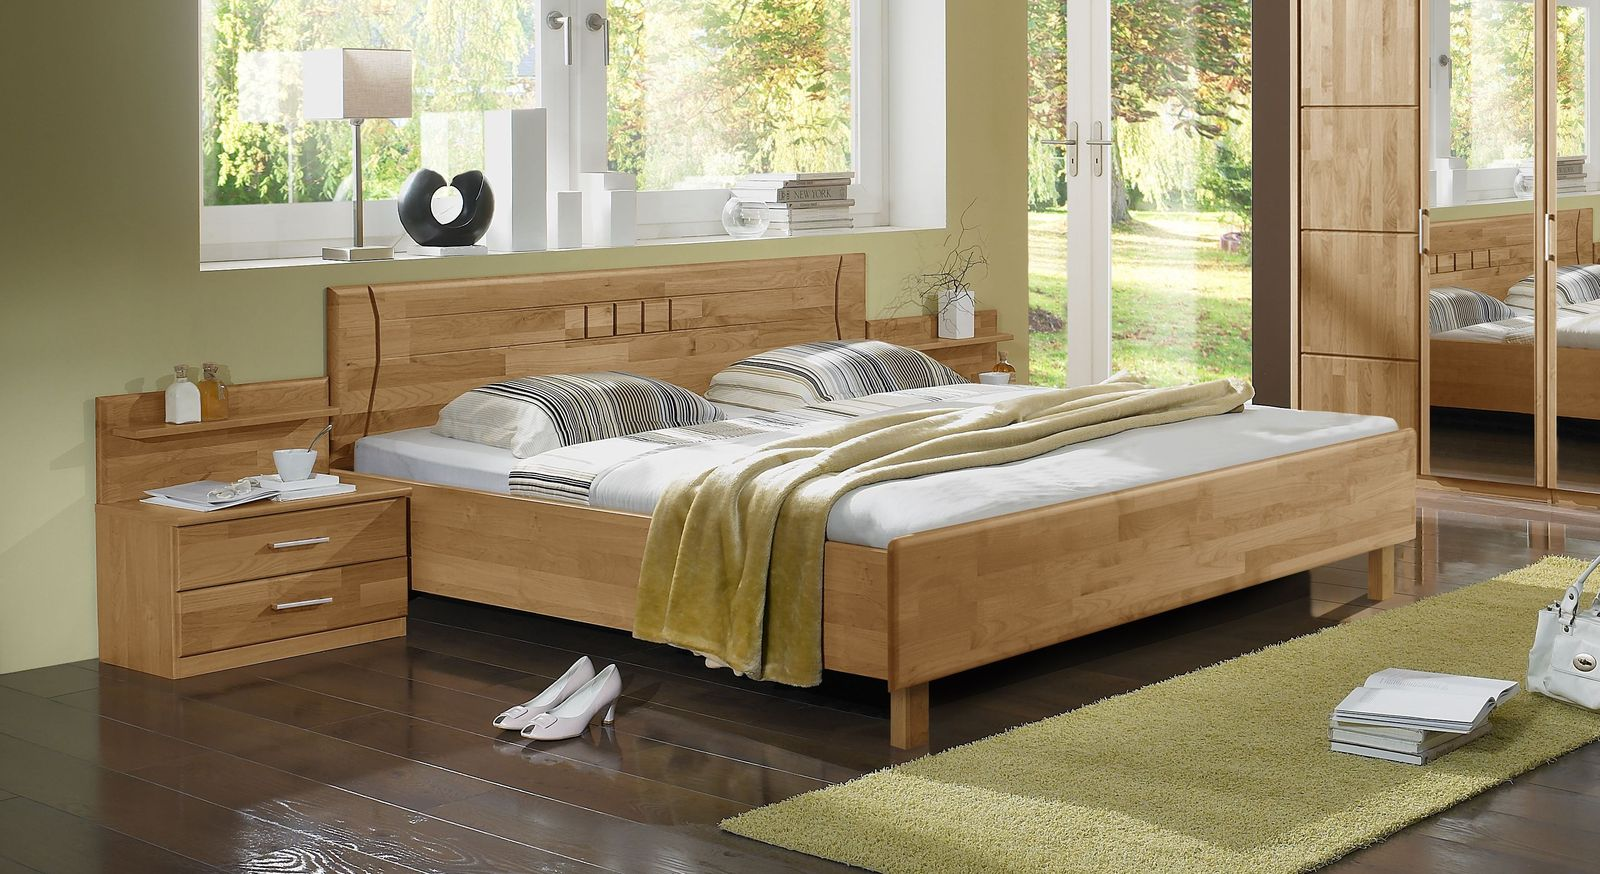 Bett Beyla aus lackiertem Erlenholz